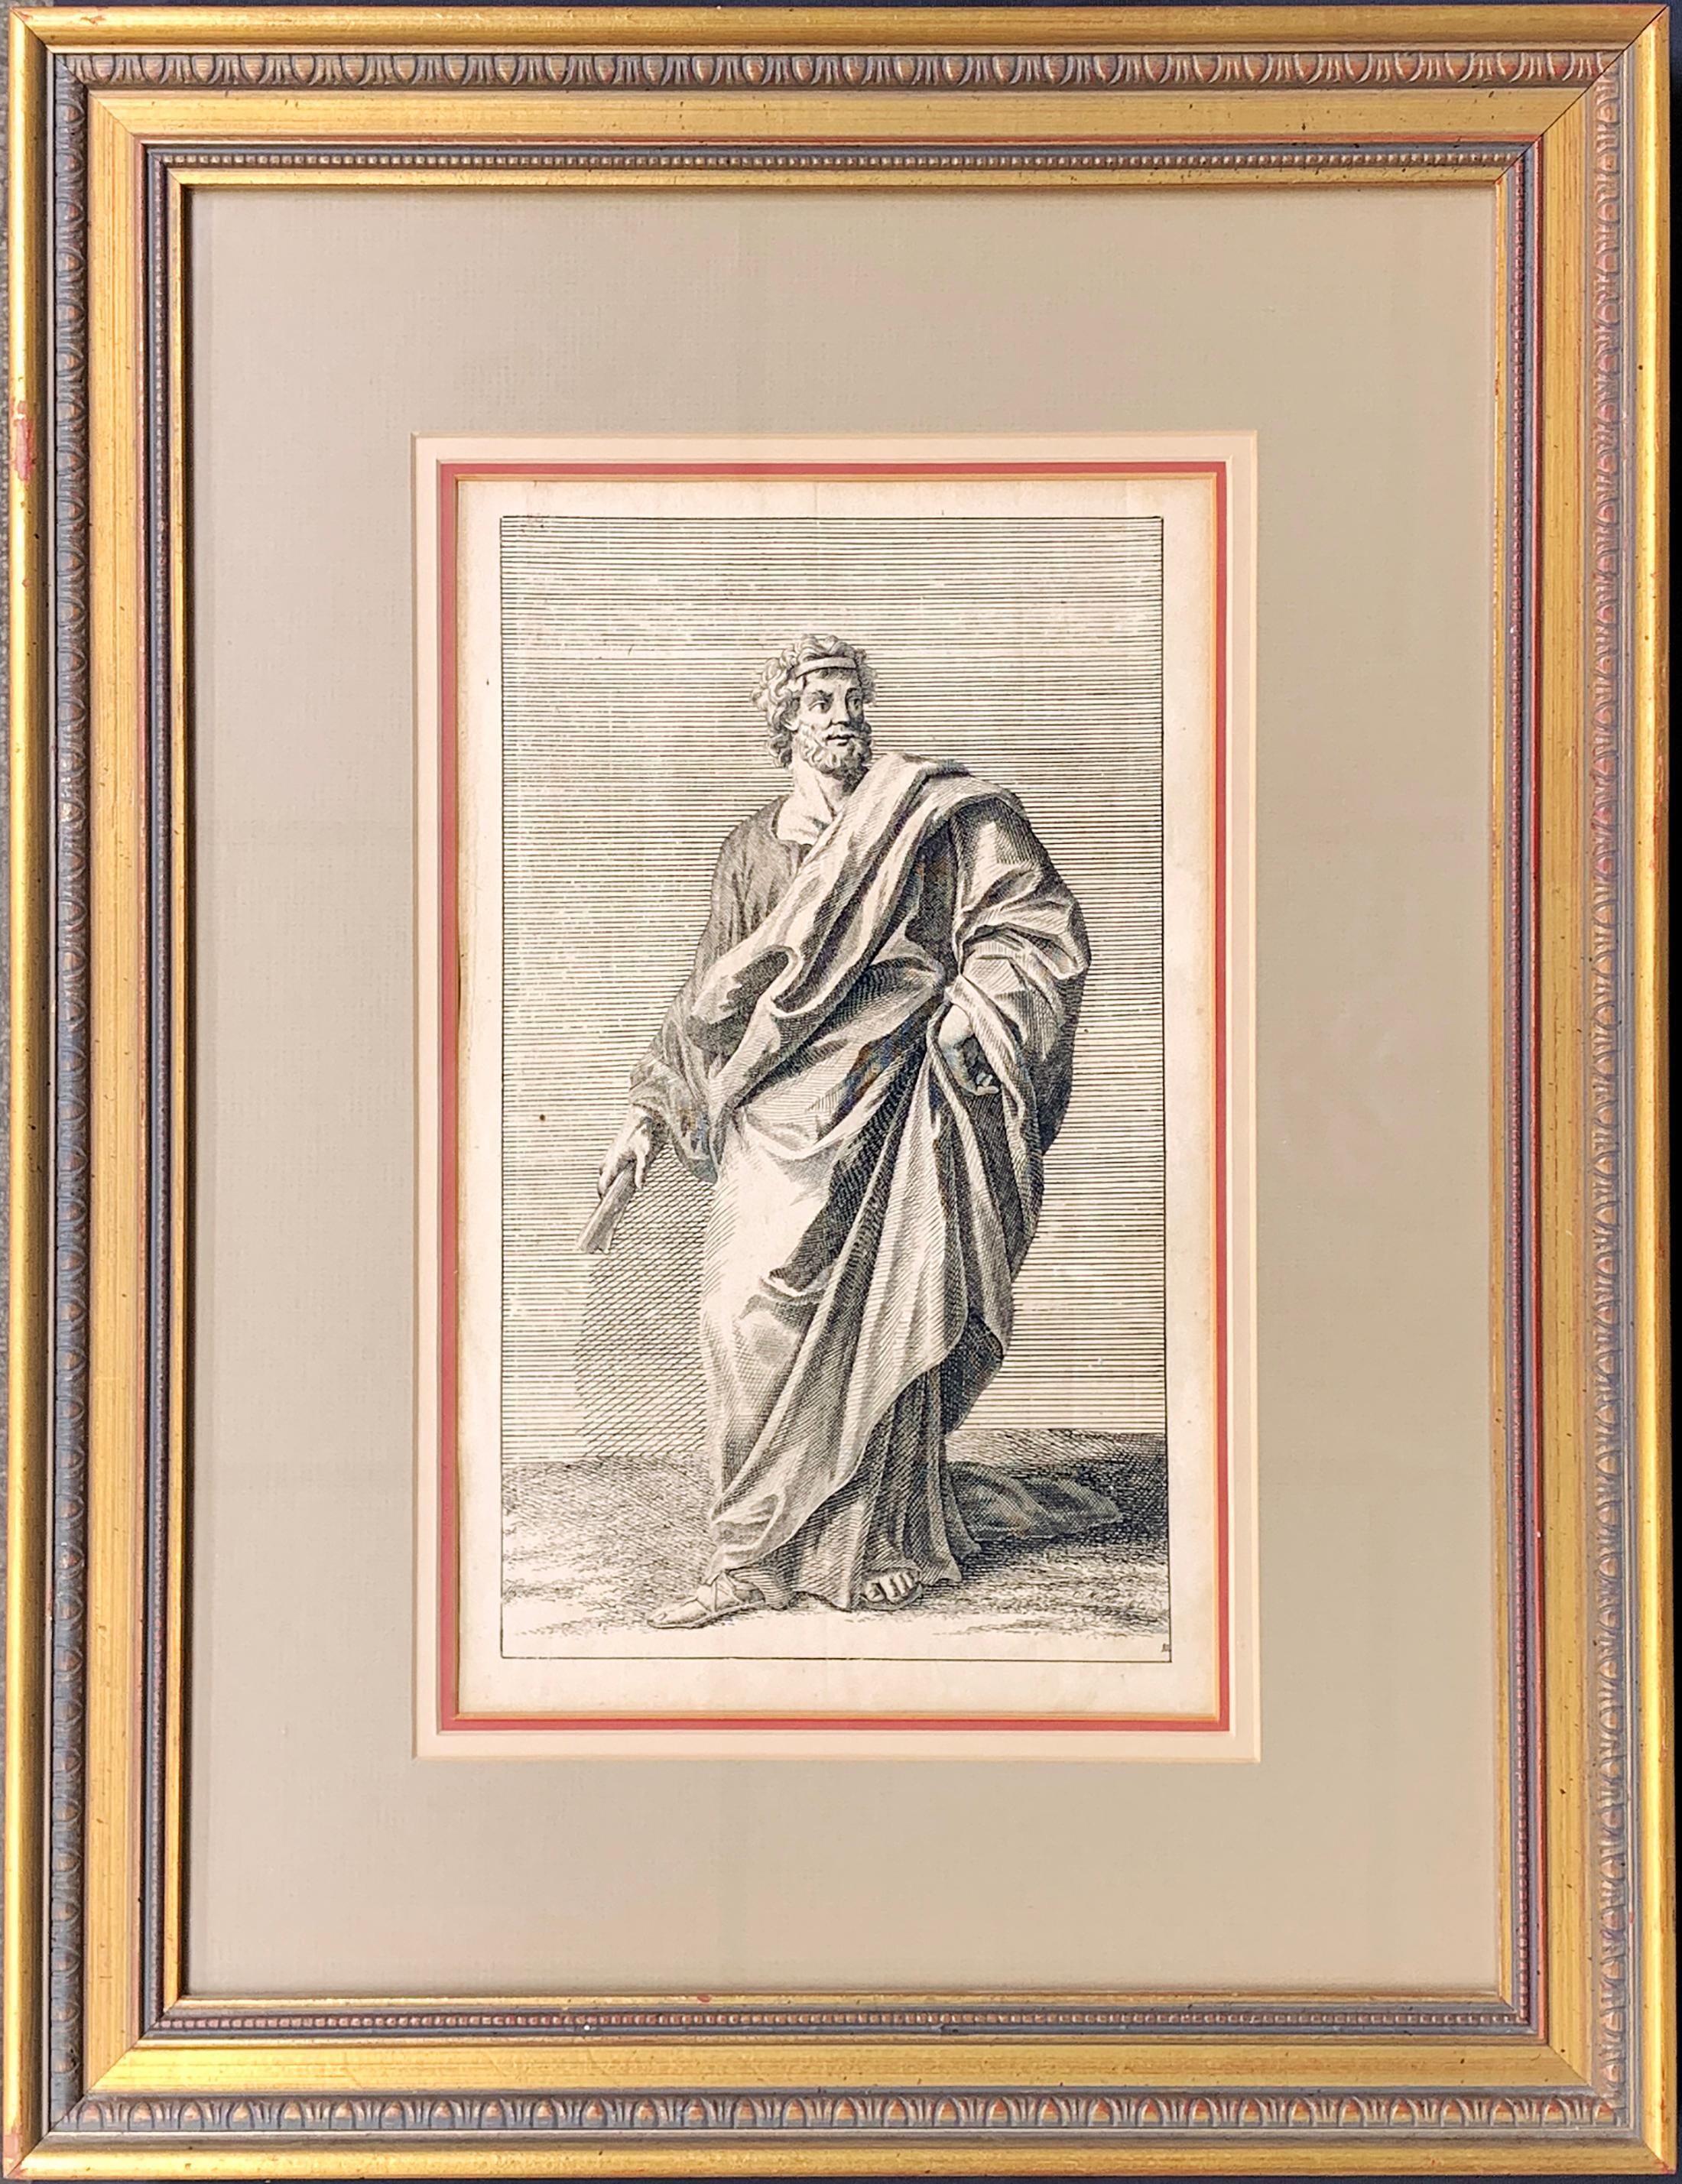 18th c. German Intaglio Engraving by Georg Preisler #10 of STATUES OF ROME